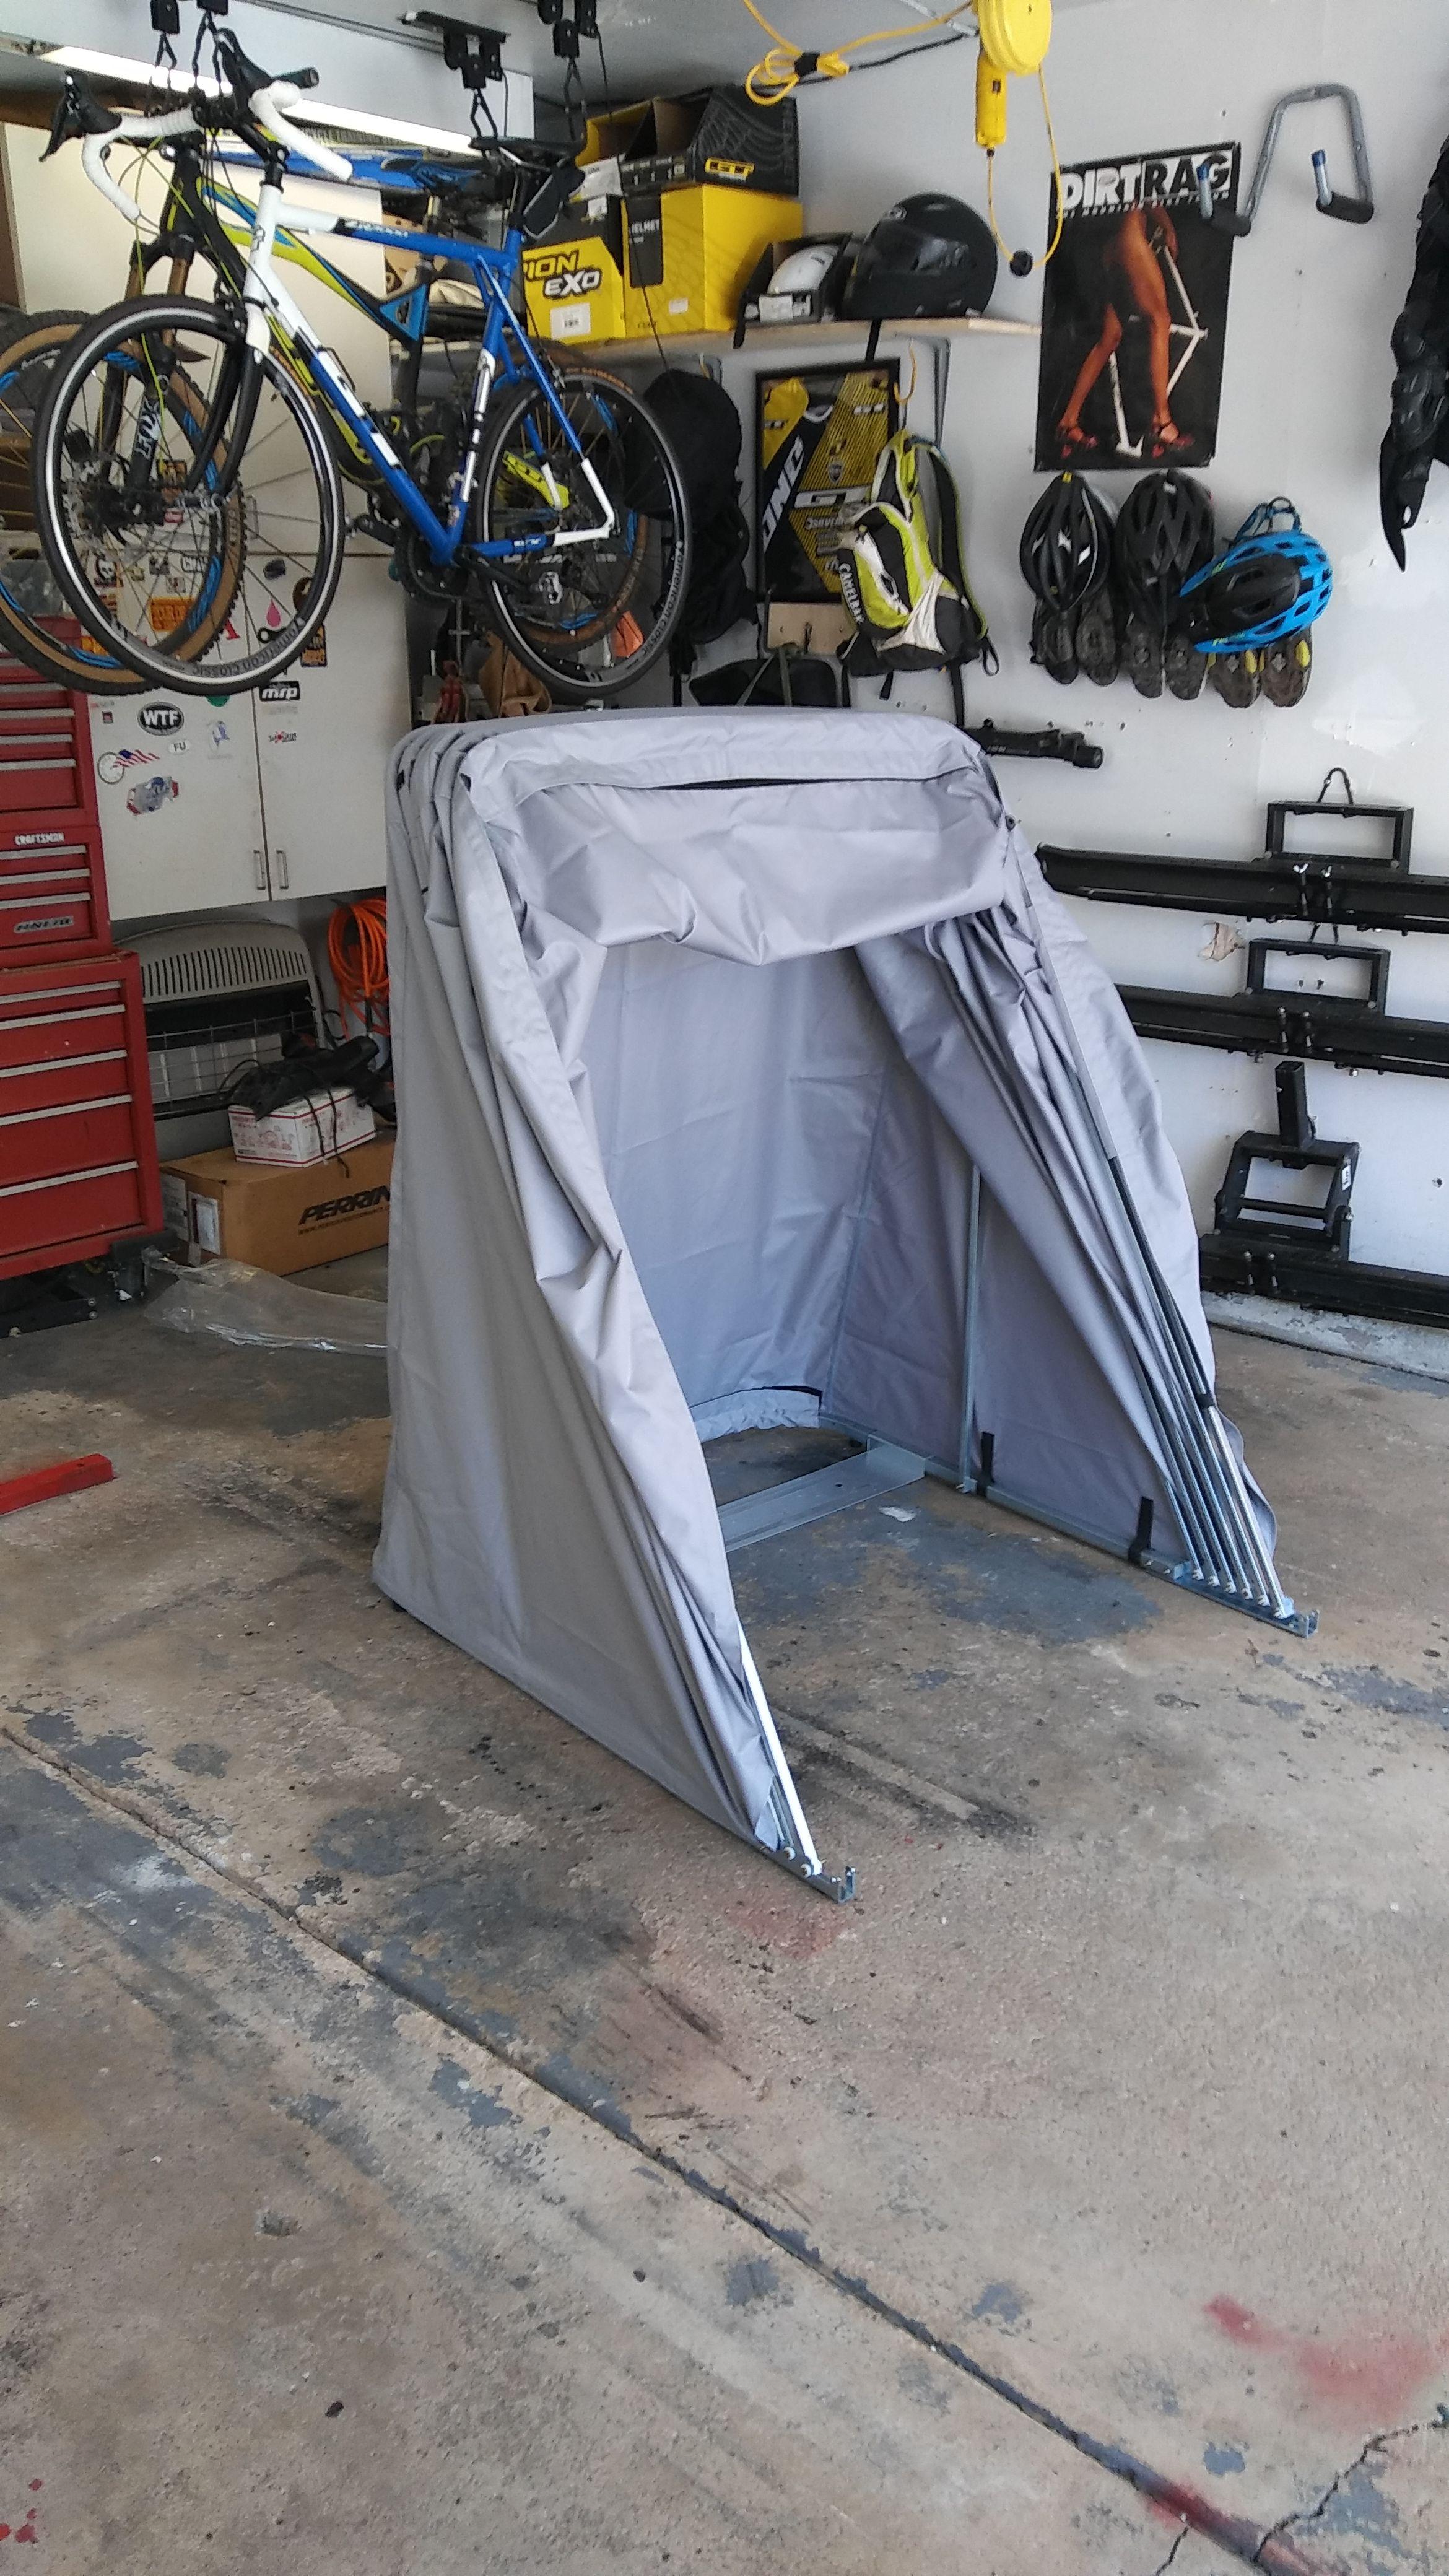 Motorcycle Shelter Cover Shed Ideias Para Pintura Carros Motos